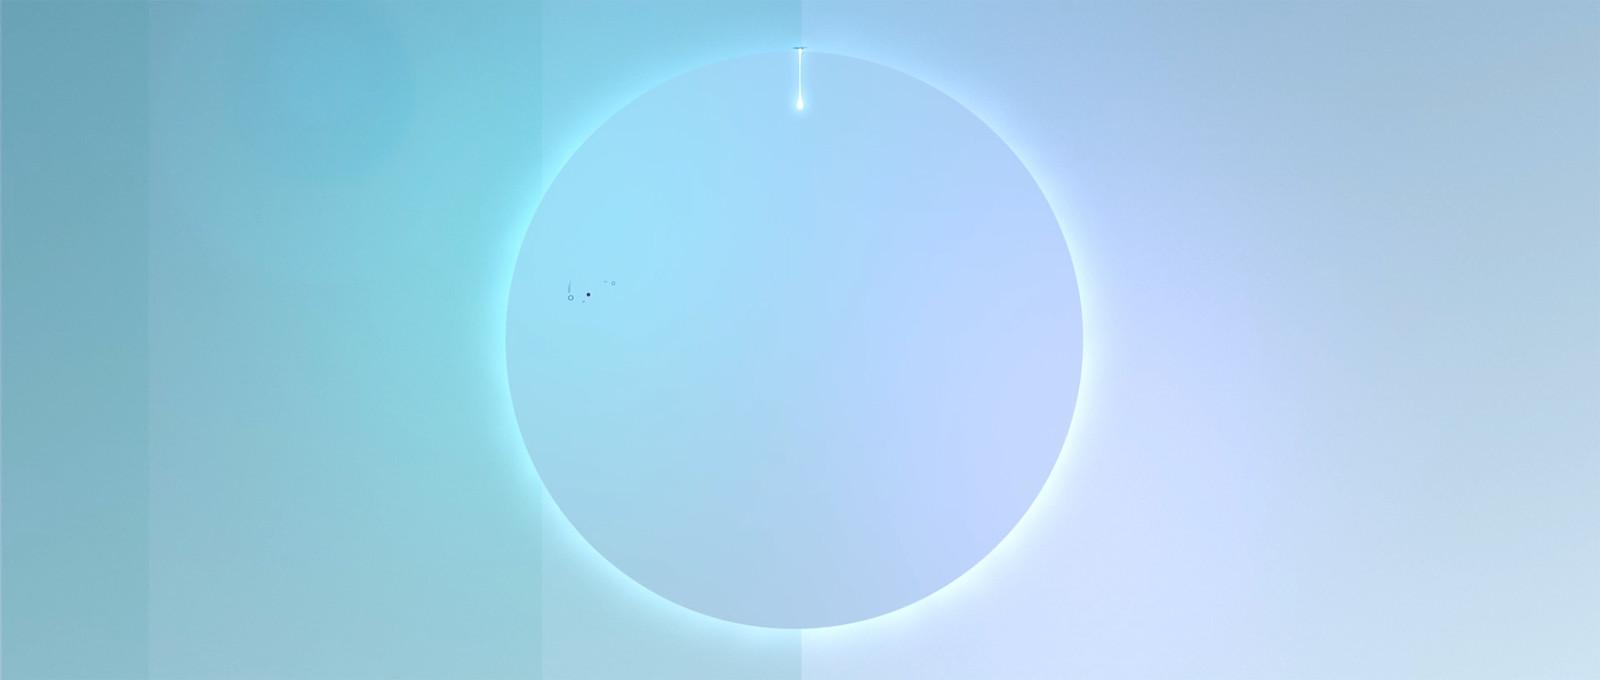 myAR Design Frame 06